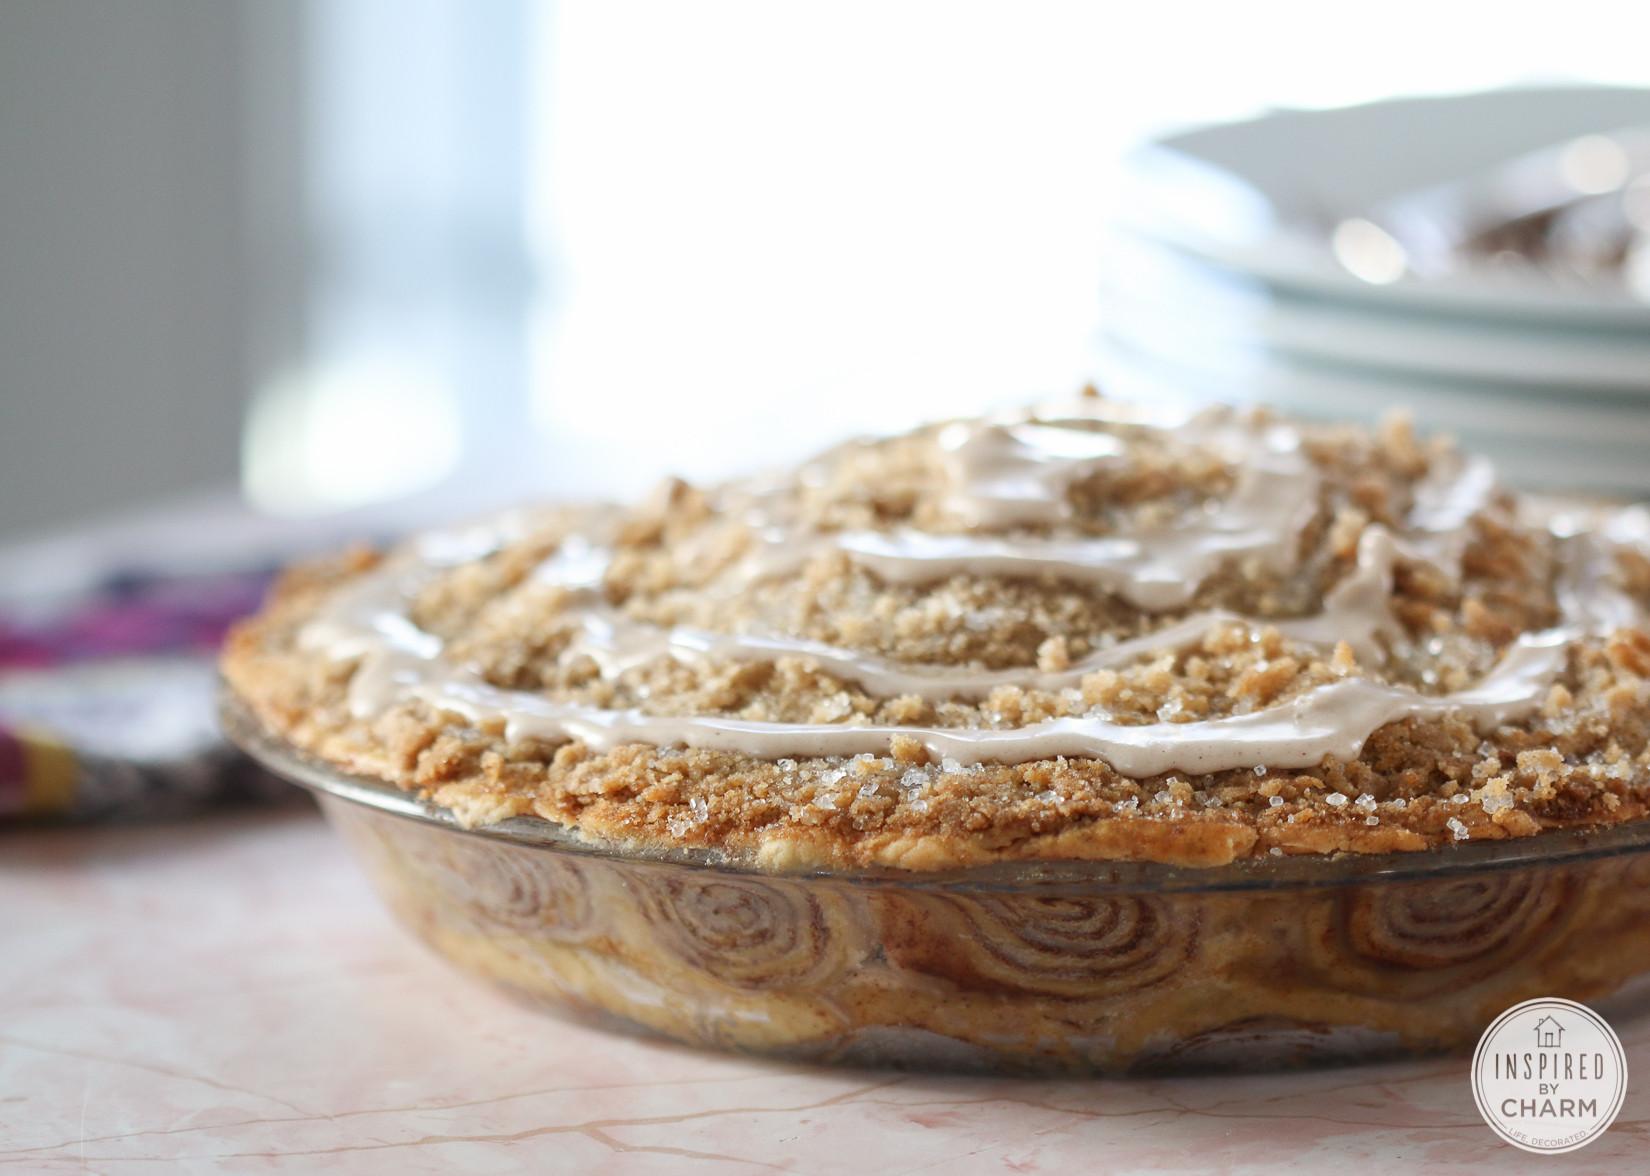 Apple Pie With Cinnamon Roll Crust  Cinnamon Roll Apple Pie classic apple pie with a